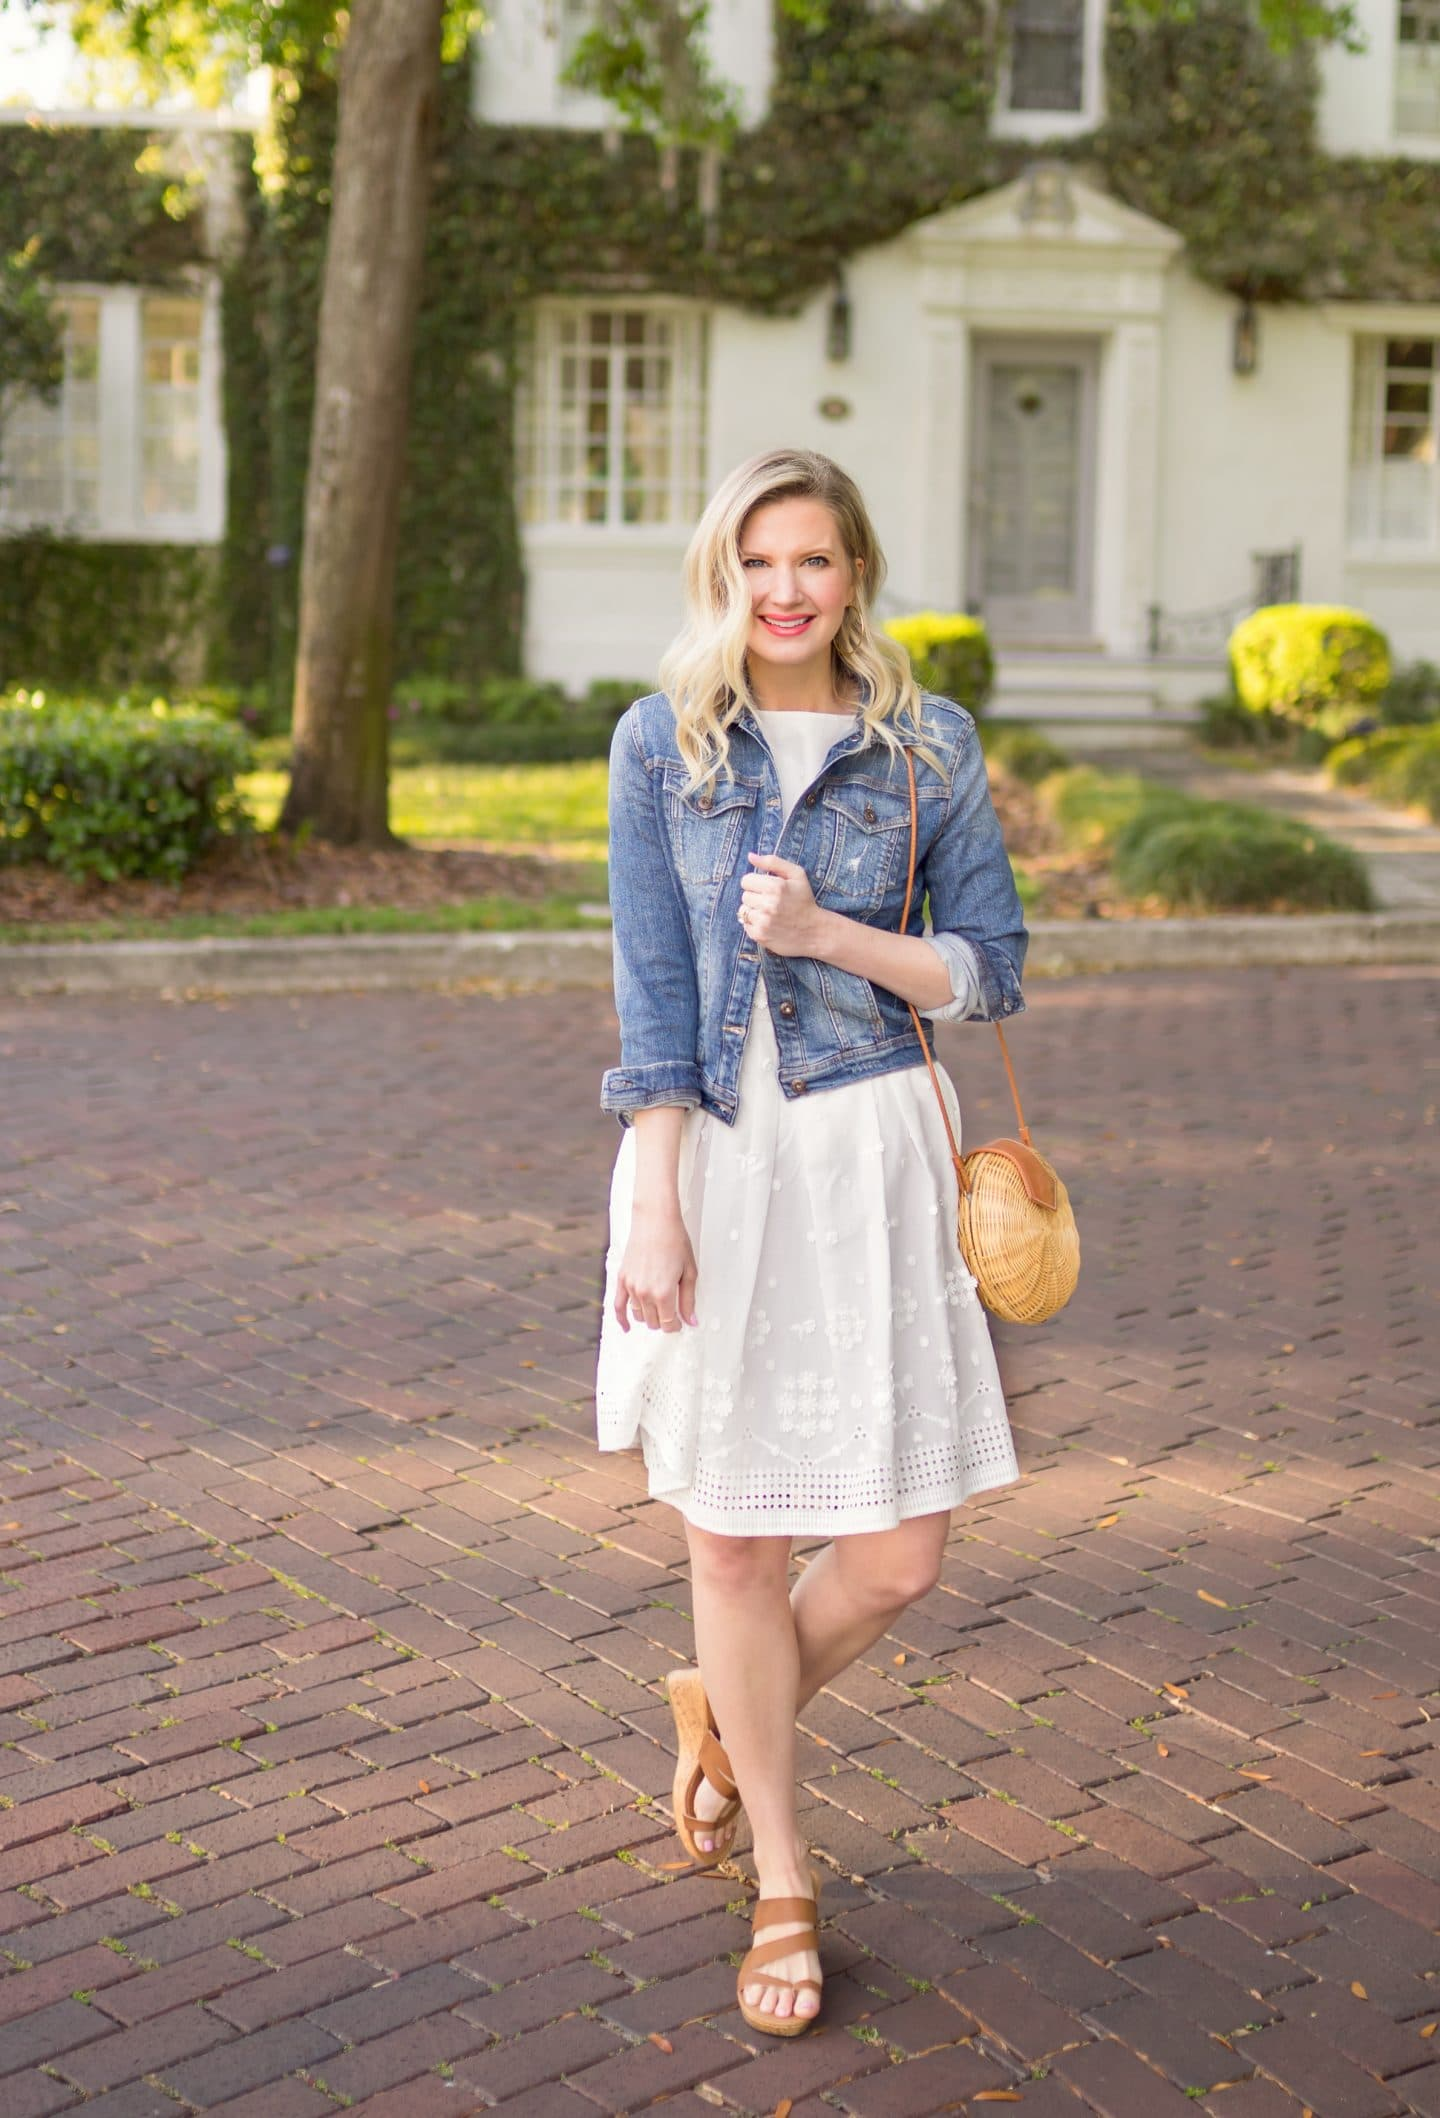 Ashley Brooke in Denim Jacket with White Dress - Ashley Brooke Designs